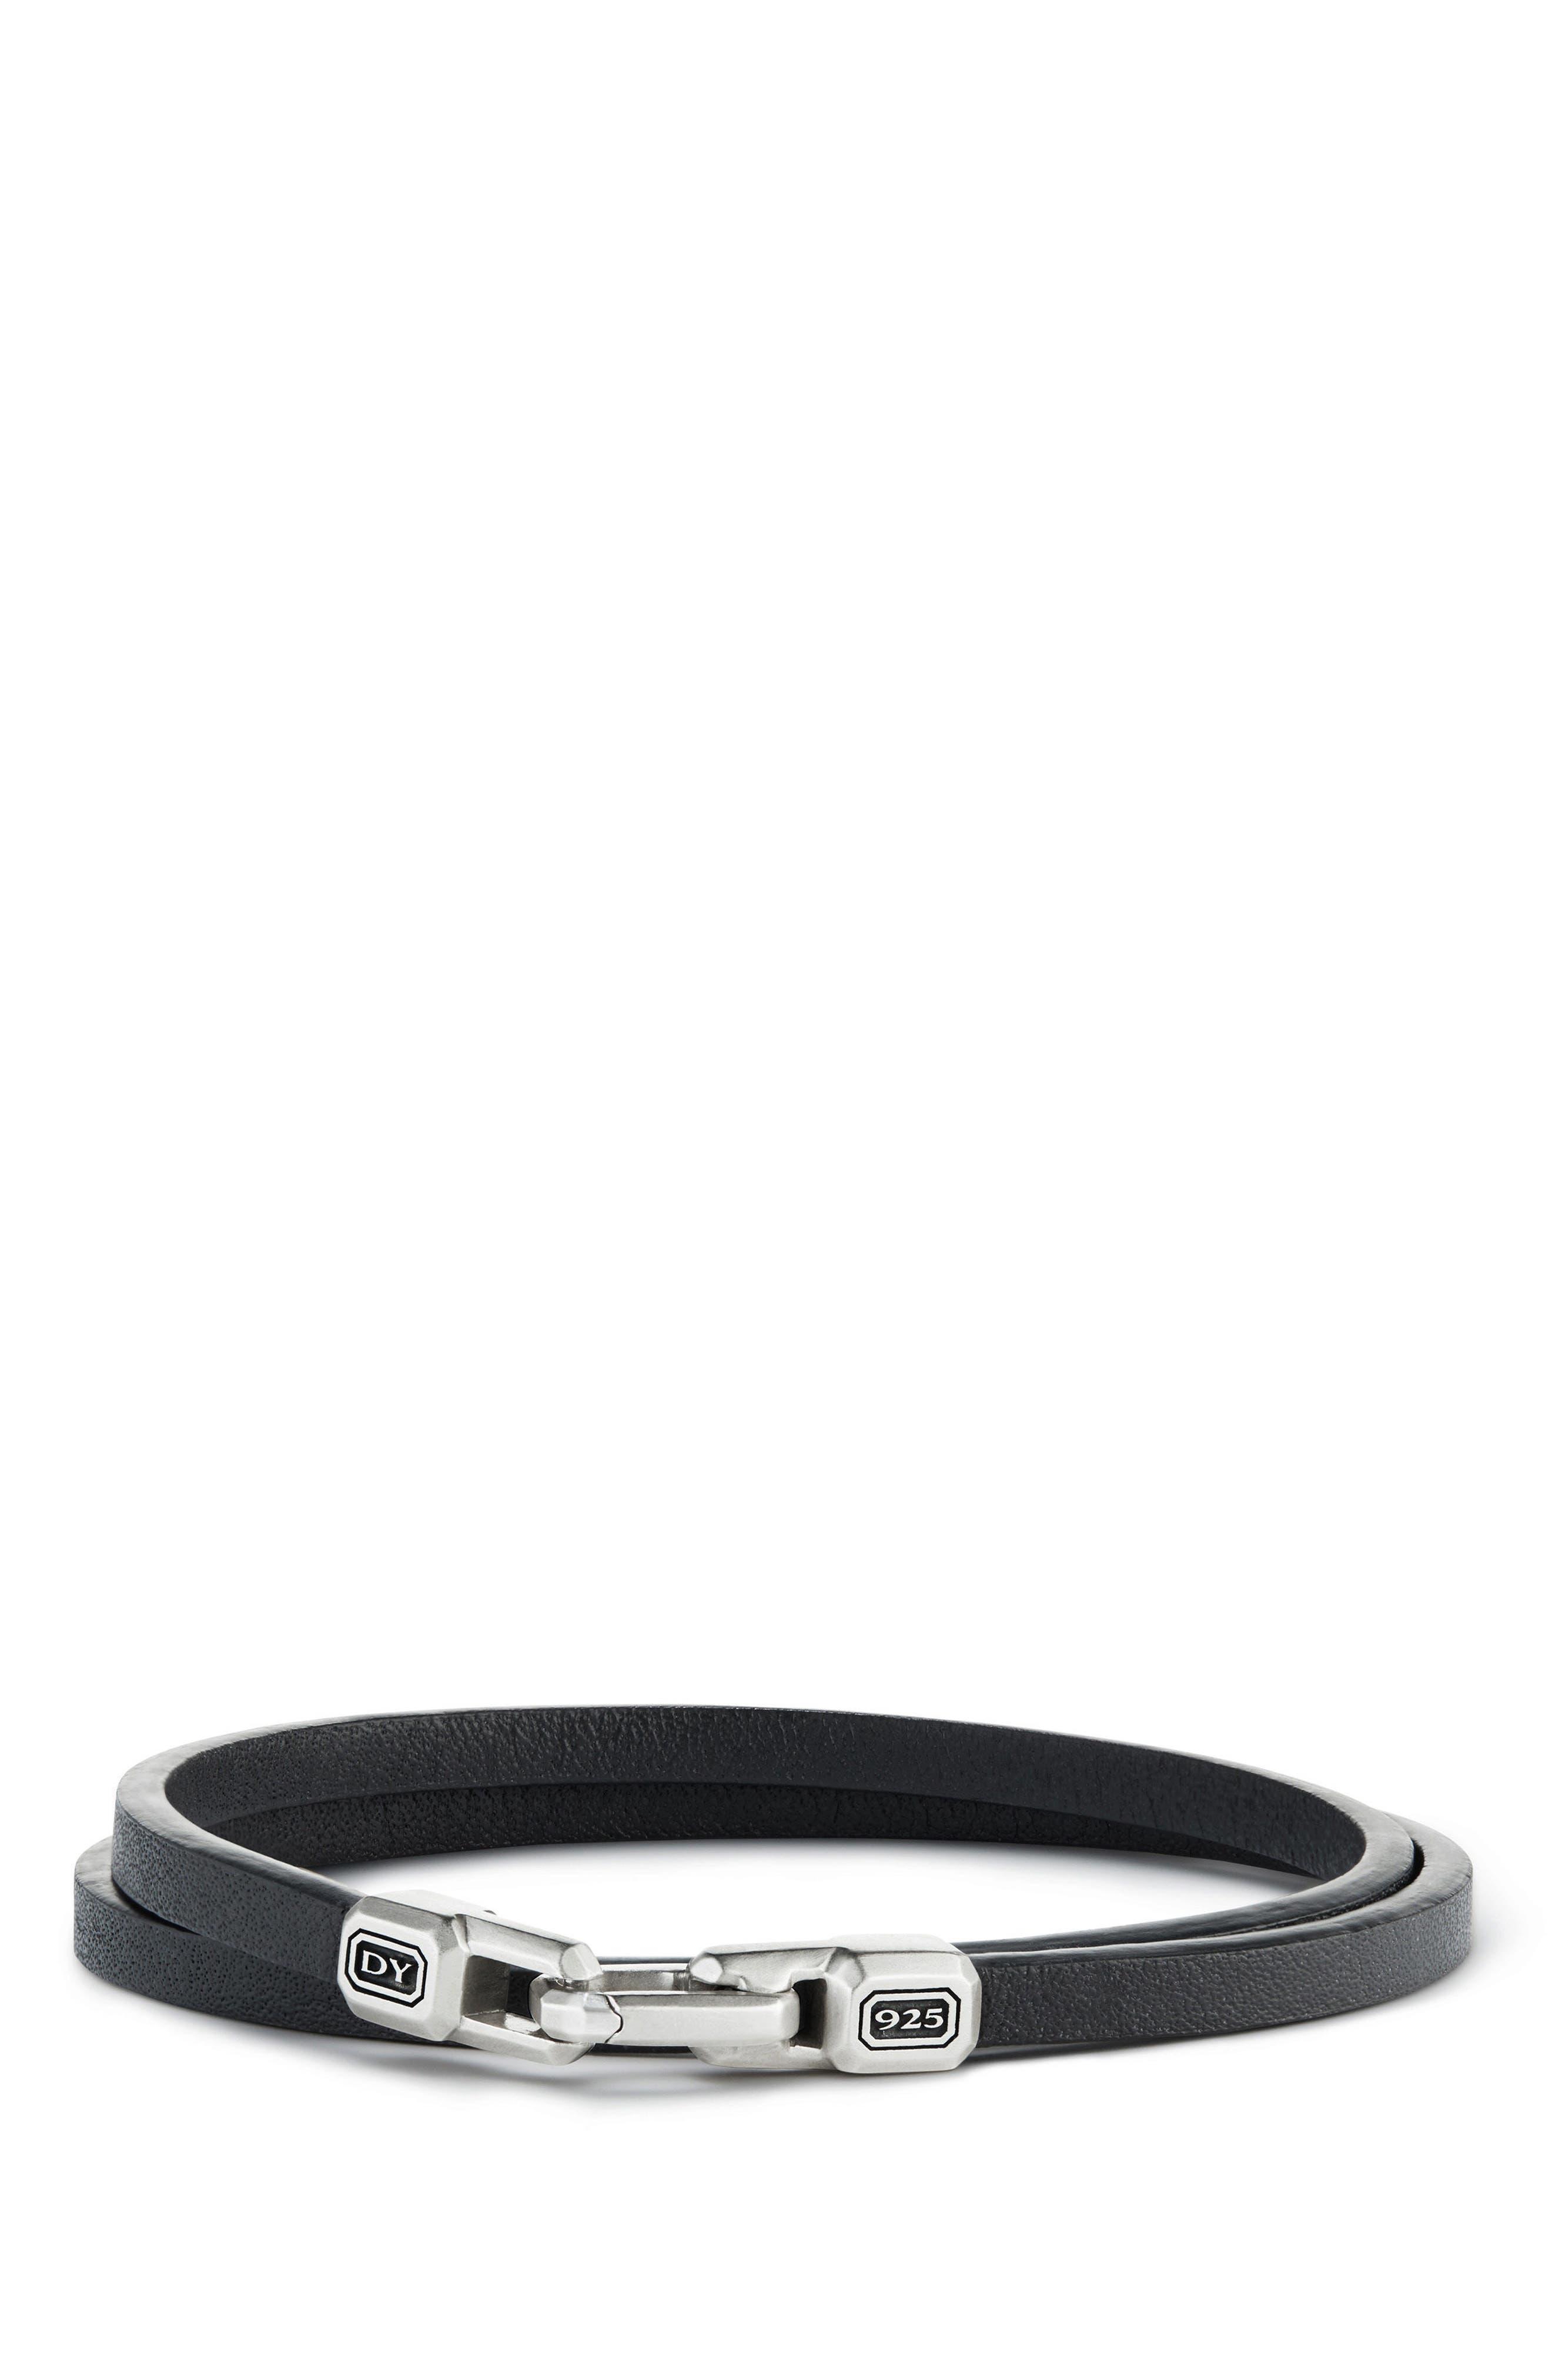 Main Image - David Yurman Streamline Double Wrap Leather Bracelet